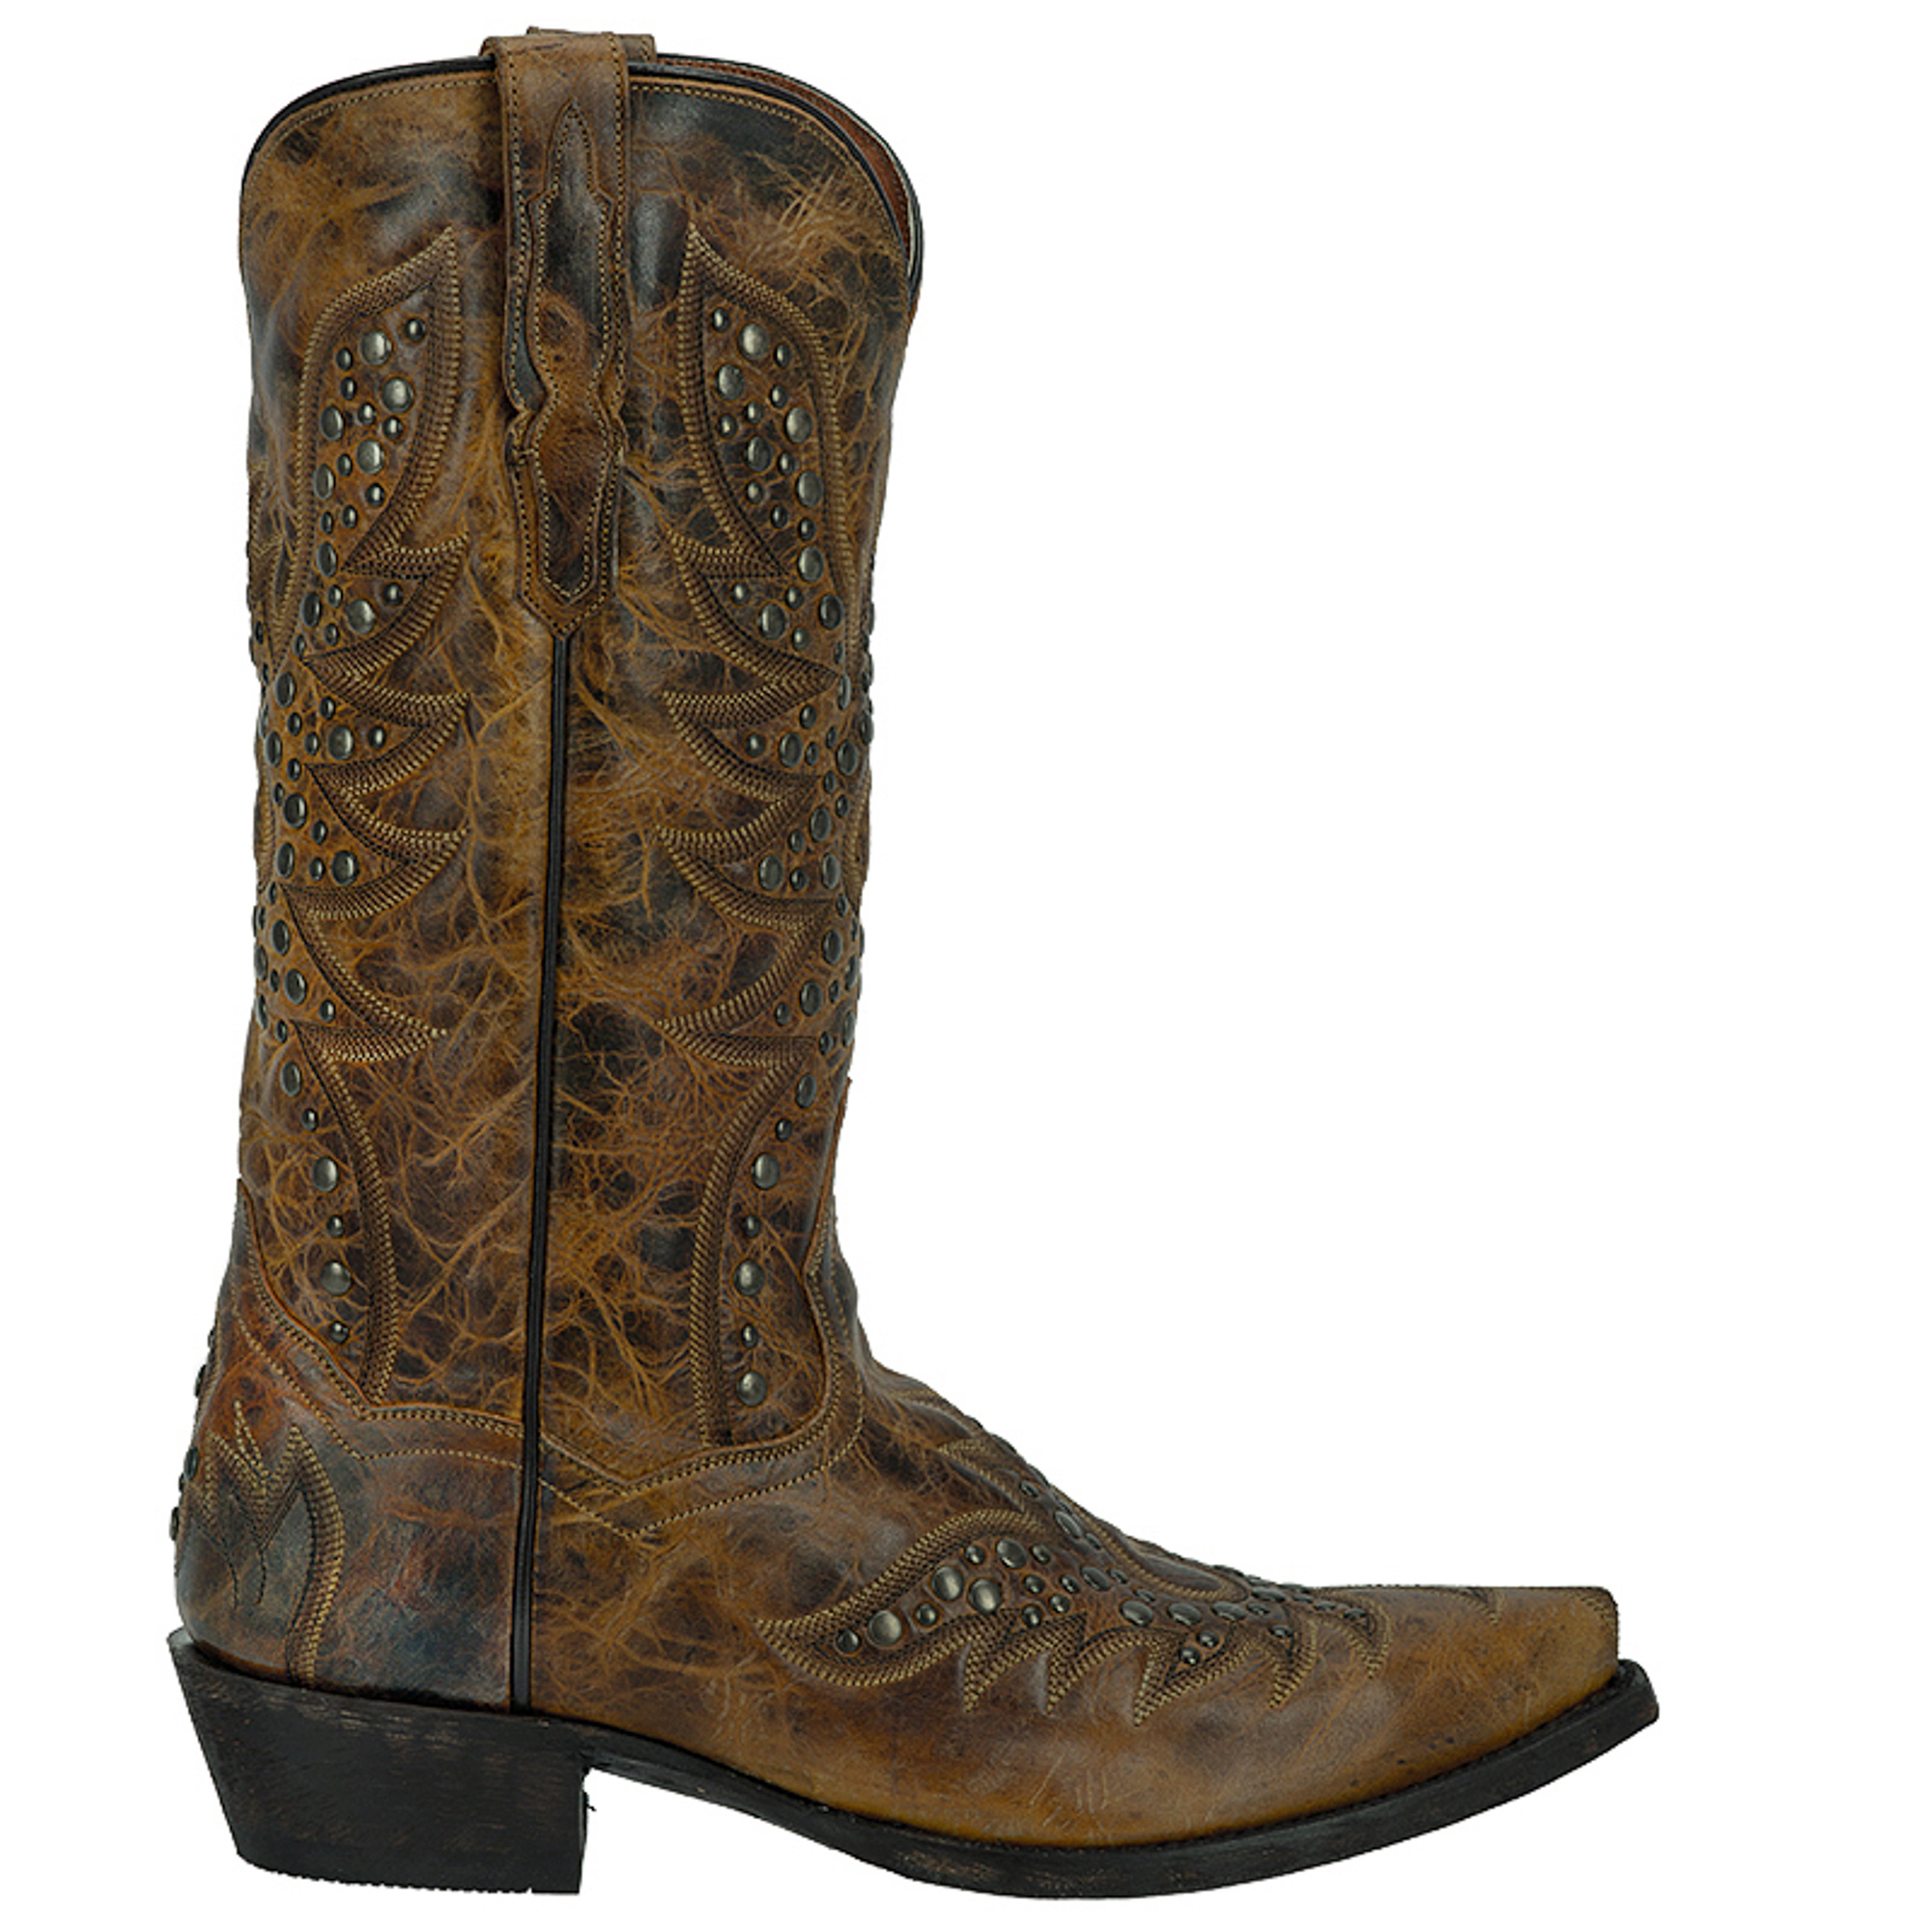 dan post mens flat leather cowboy boots studded